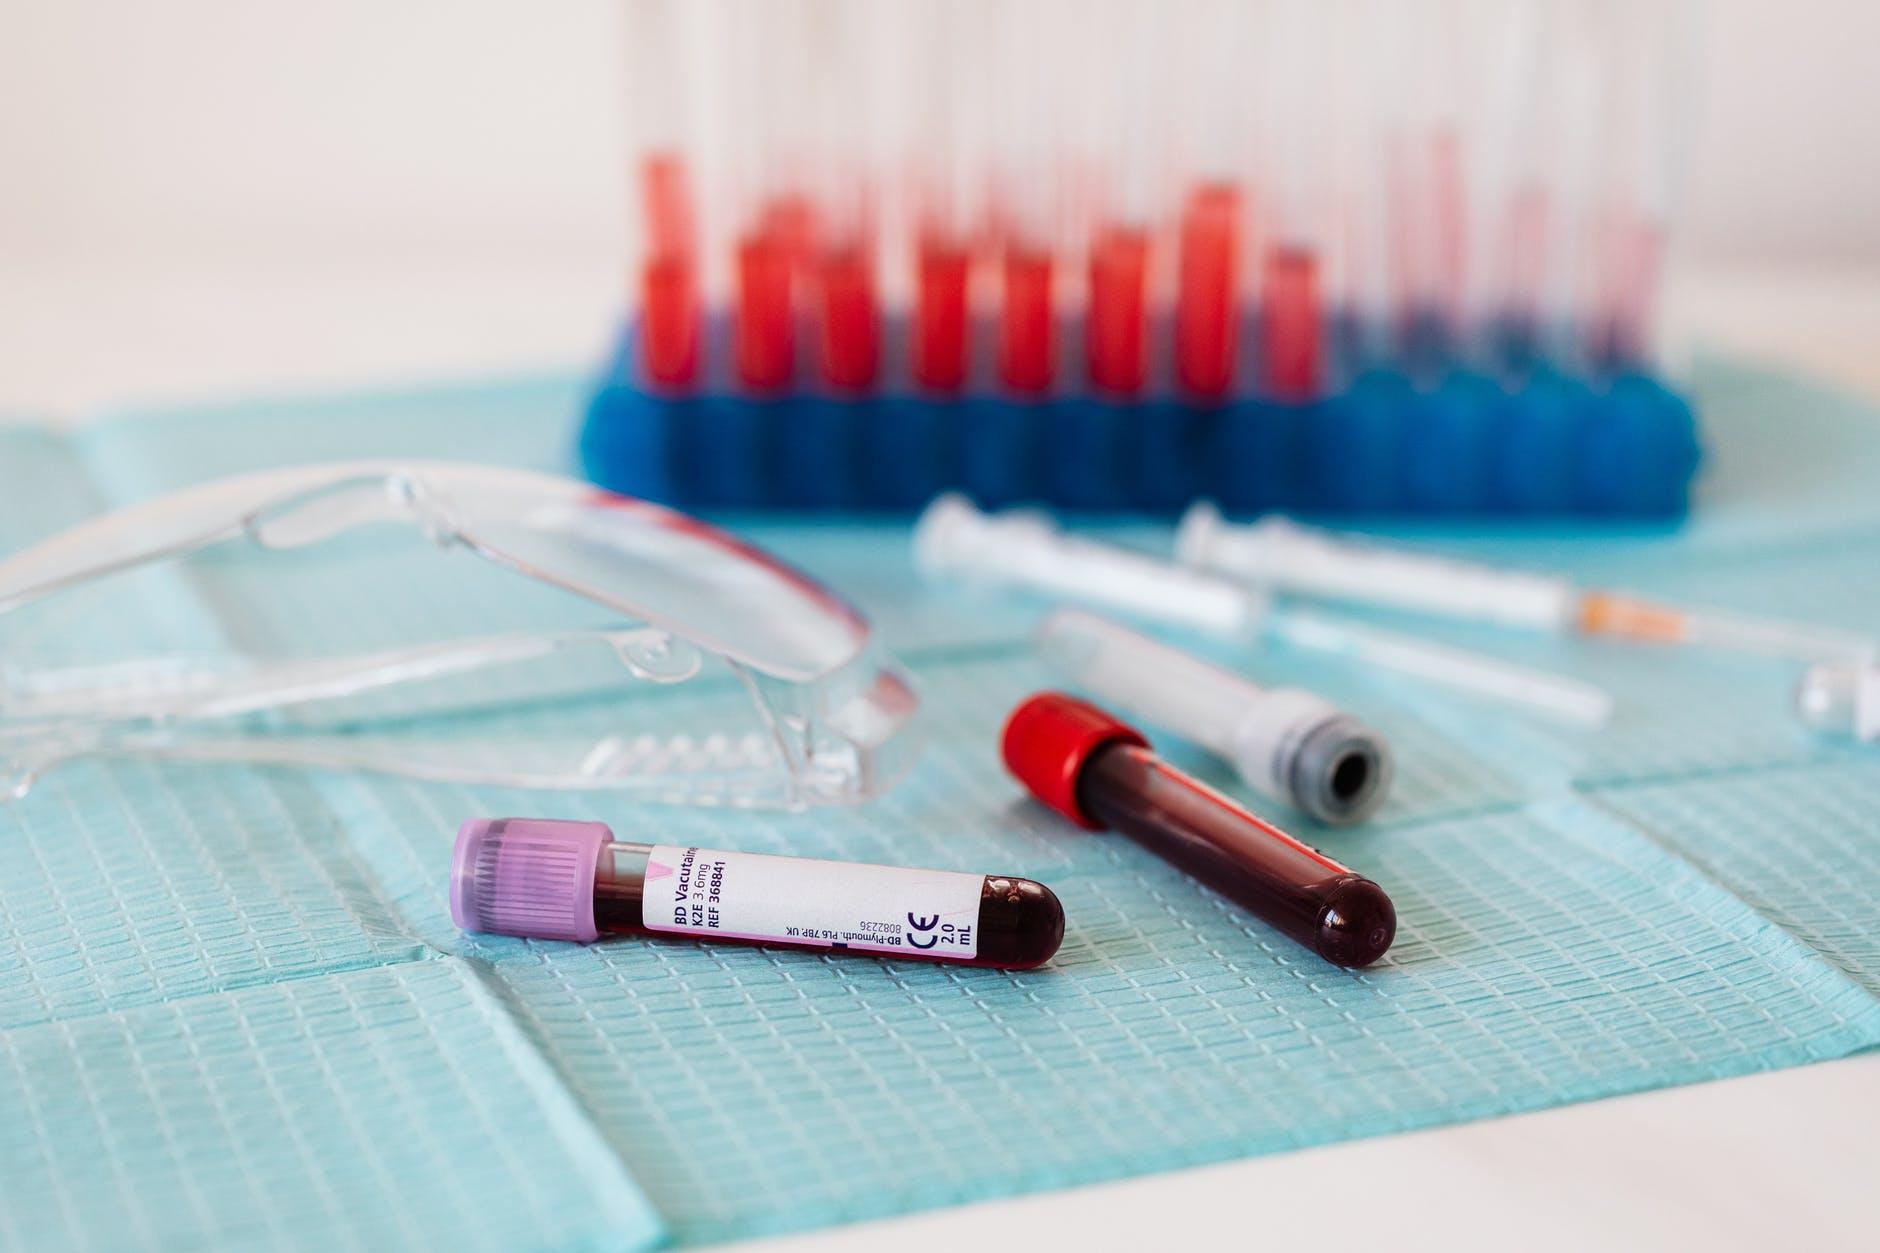 full vials of blood near various medical equipment for taking blood